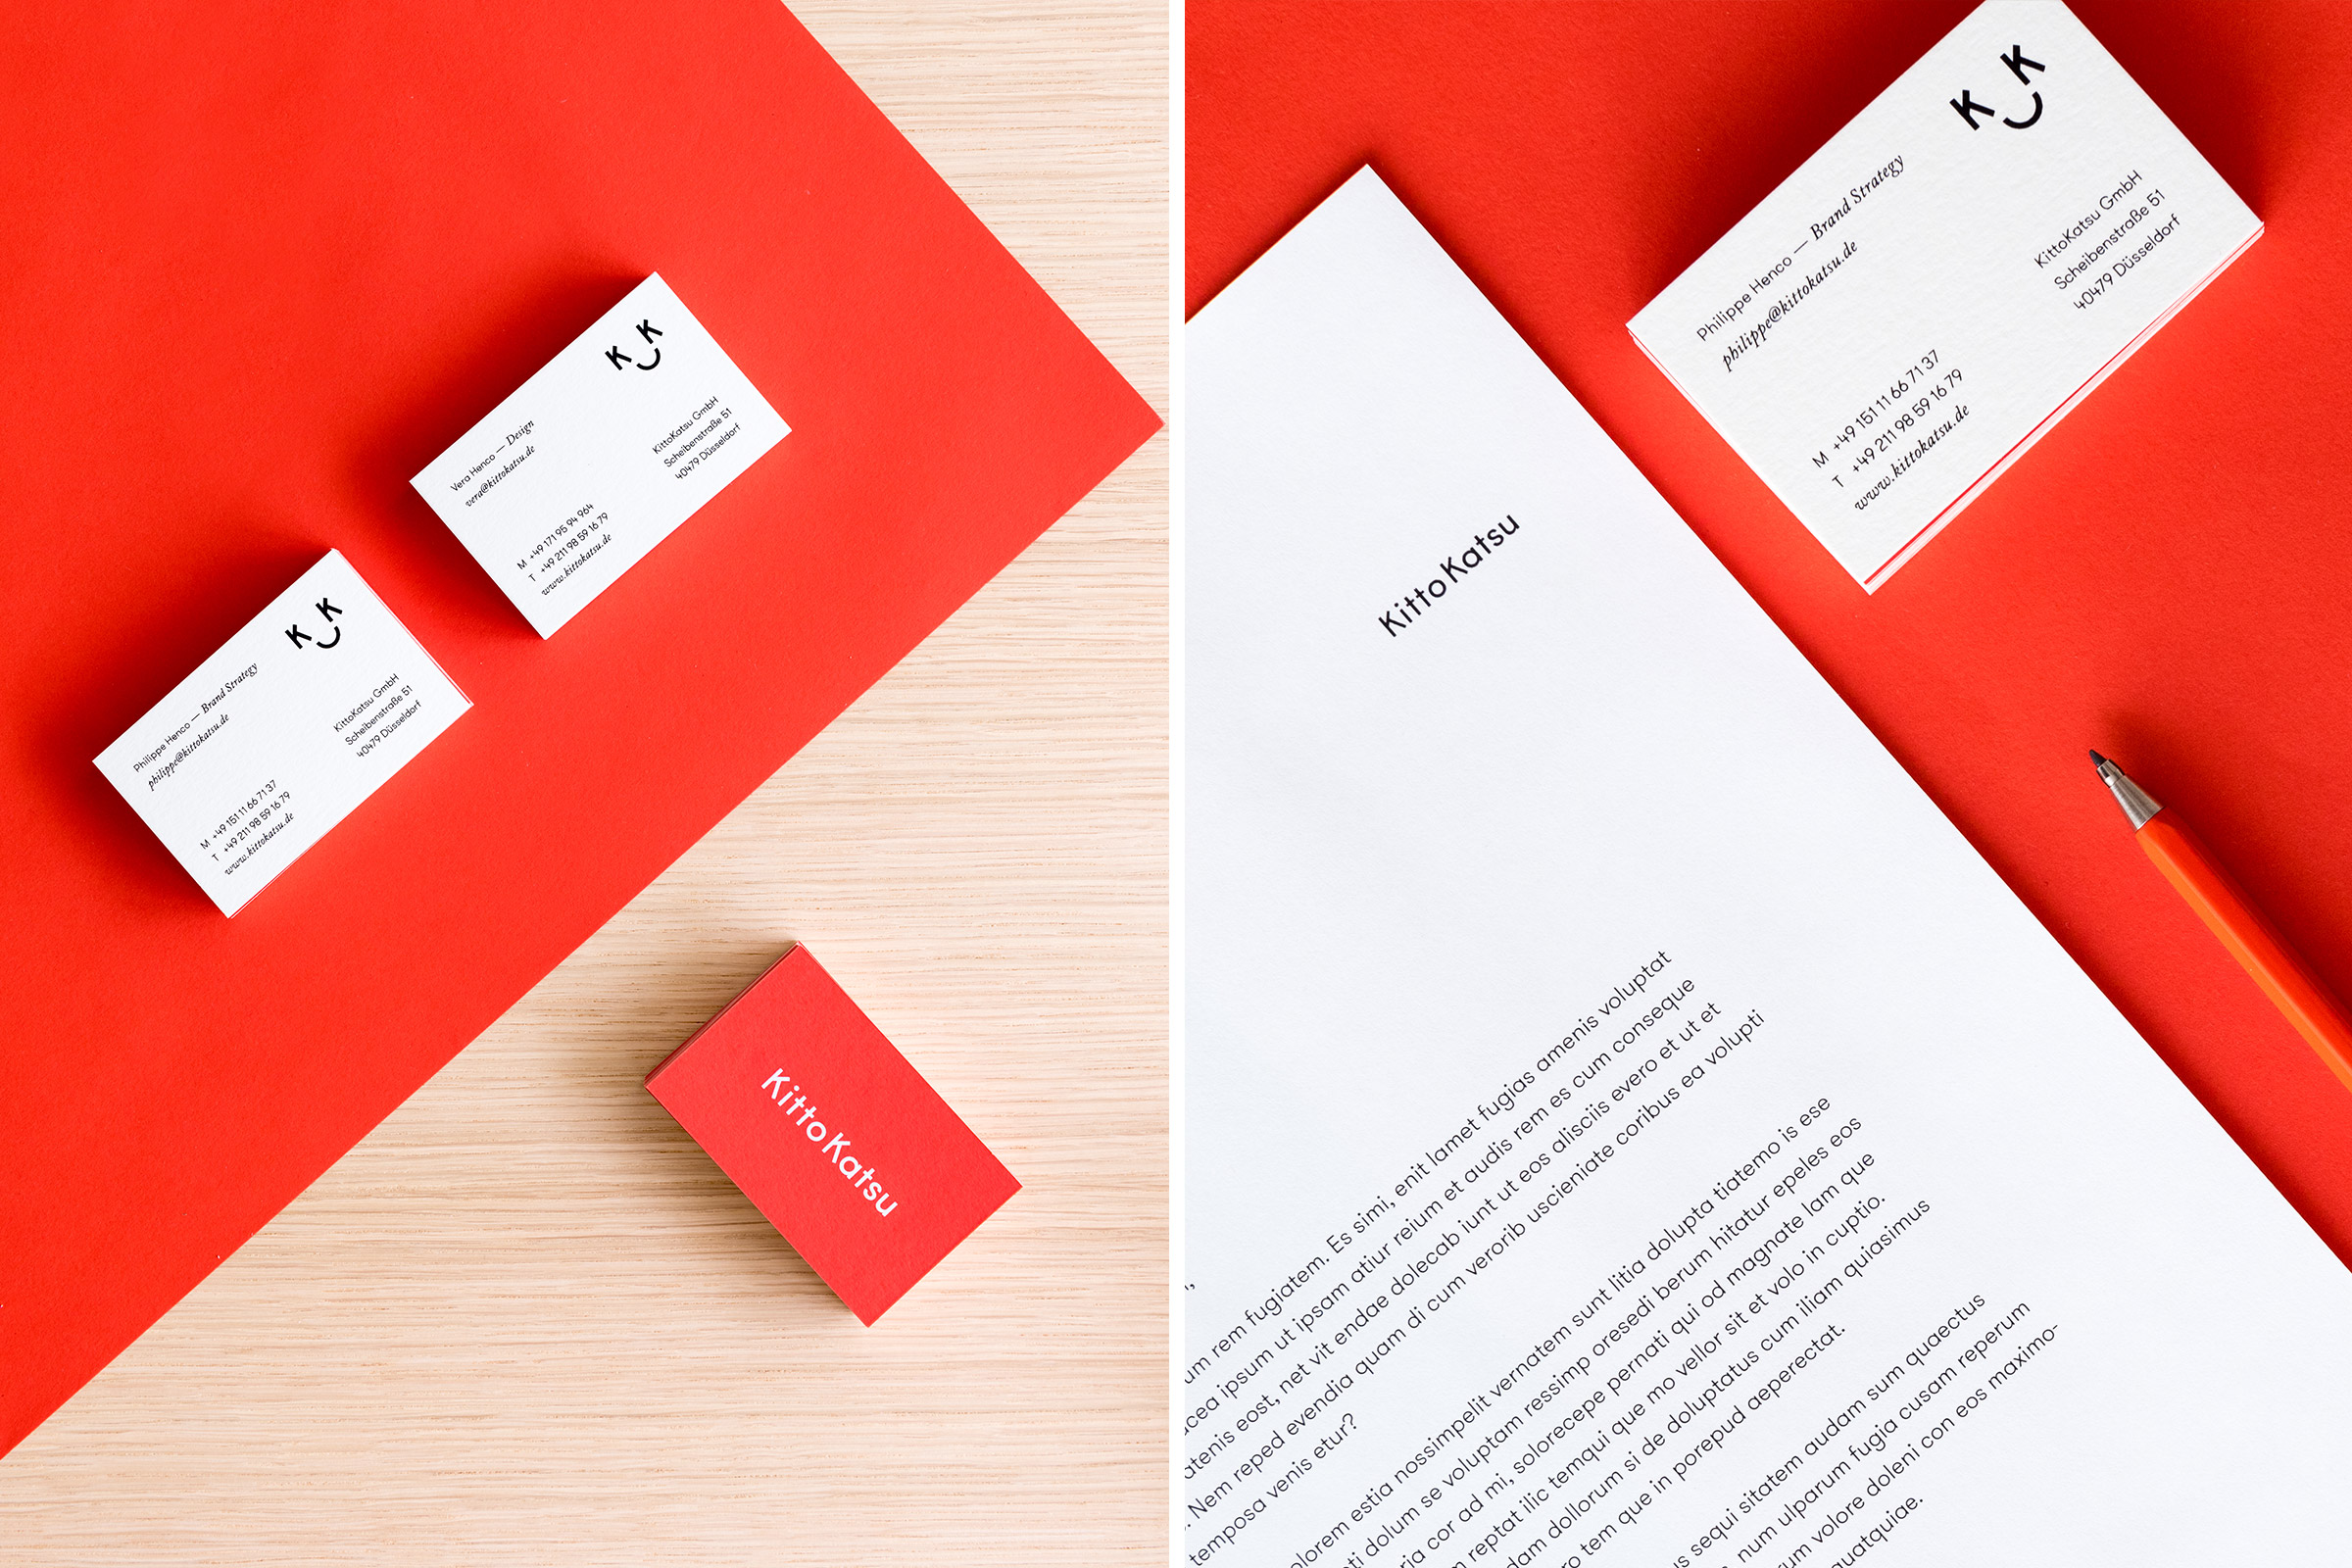 KittoKatsu, Agentur Corporate Design, Agentur Markenführung, Visitenkarte